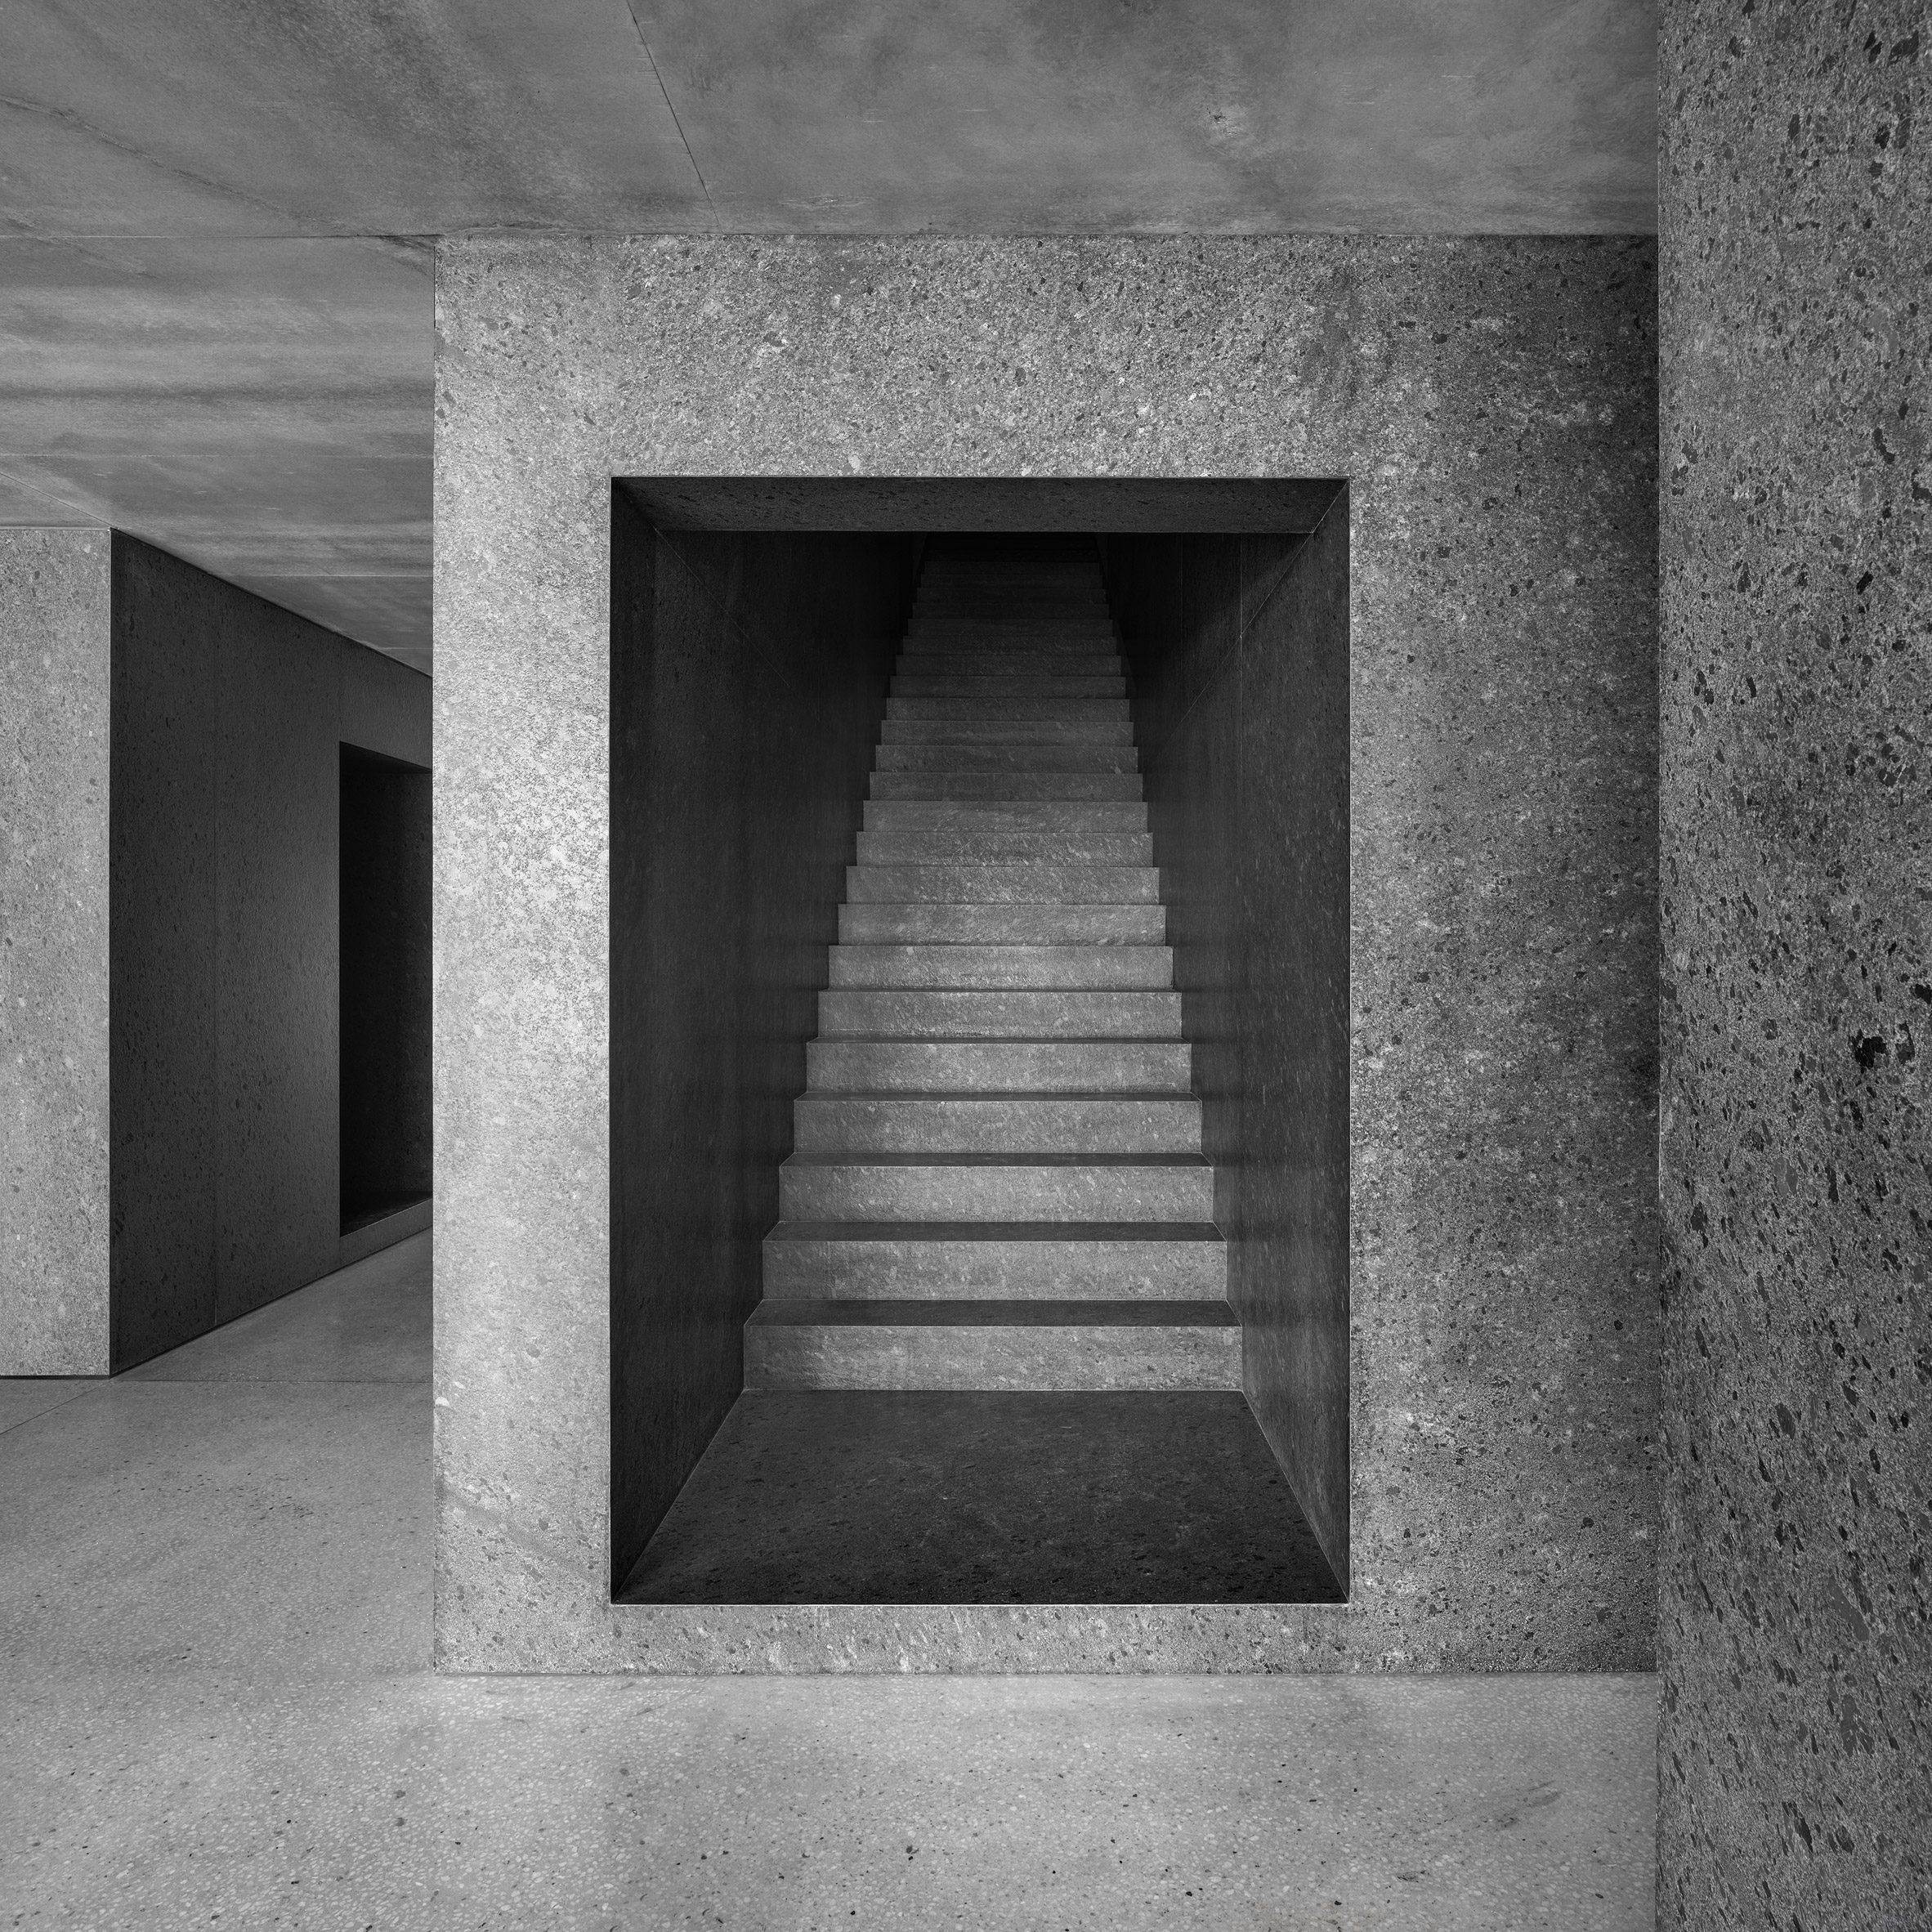 Large granite staircase